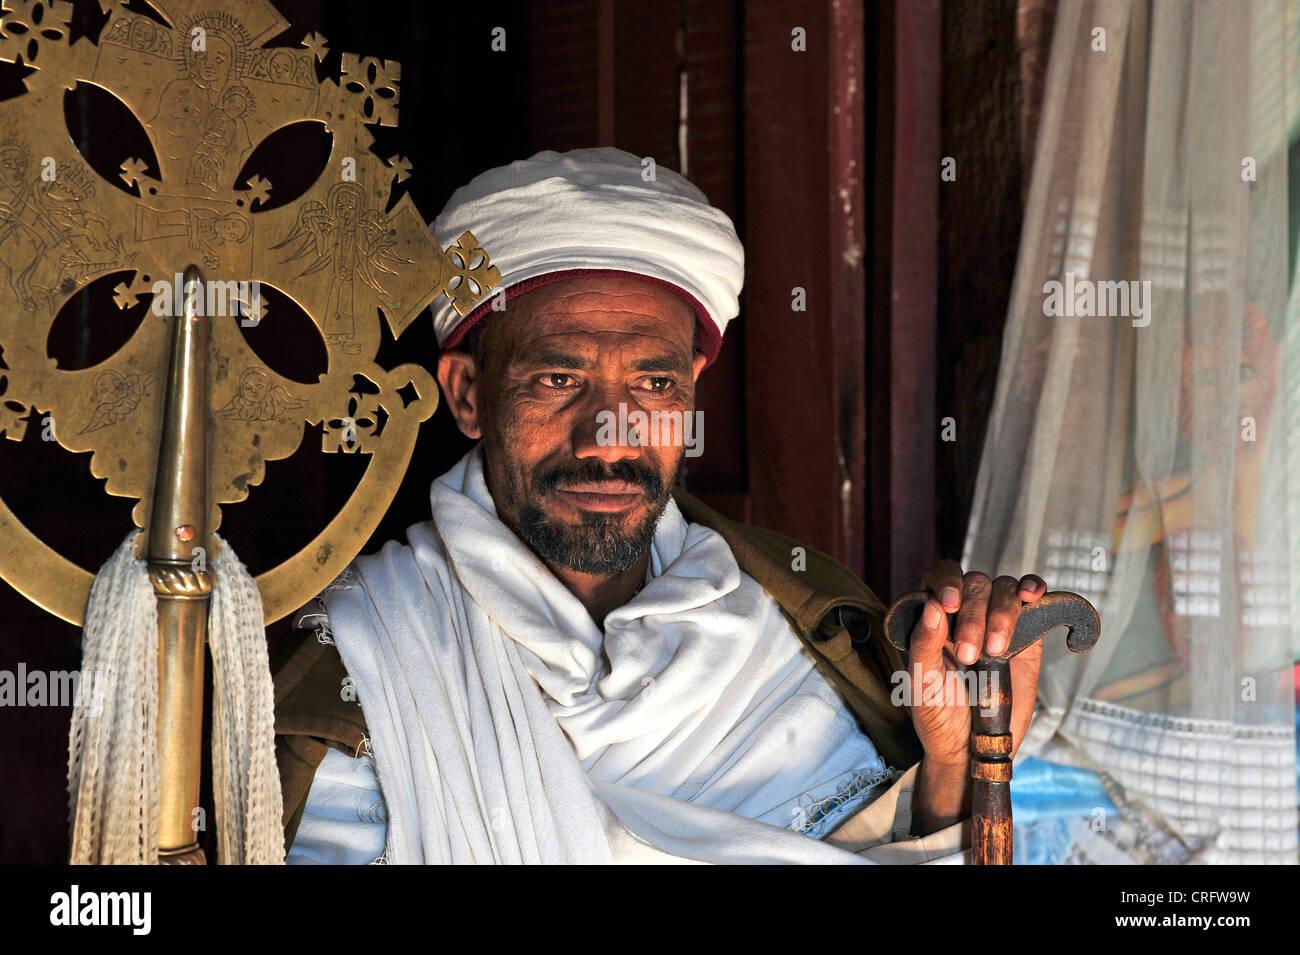 priest, Ethiopia, Lalibela - Stock Image